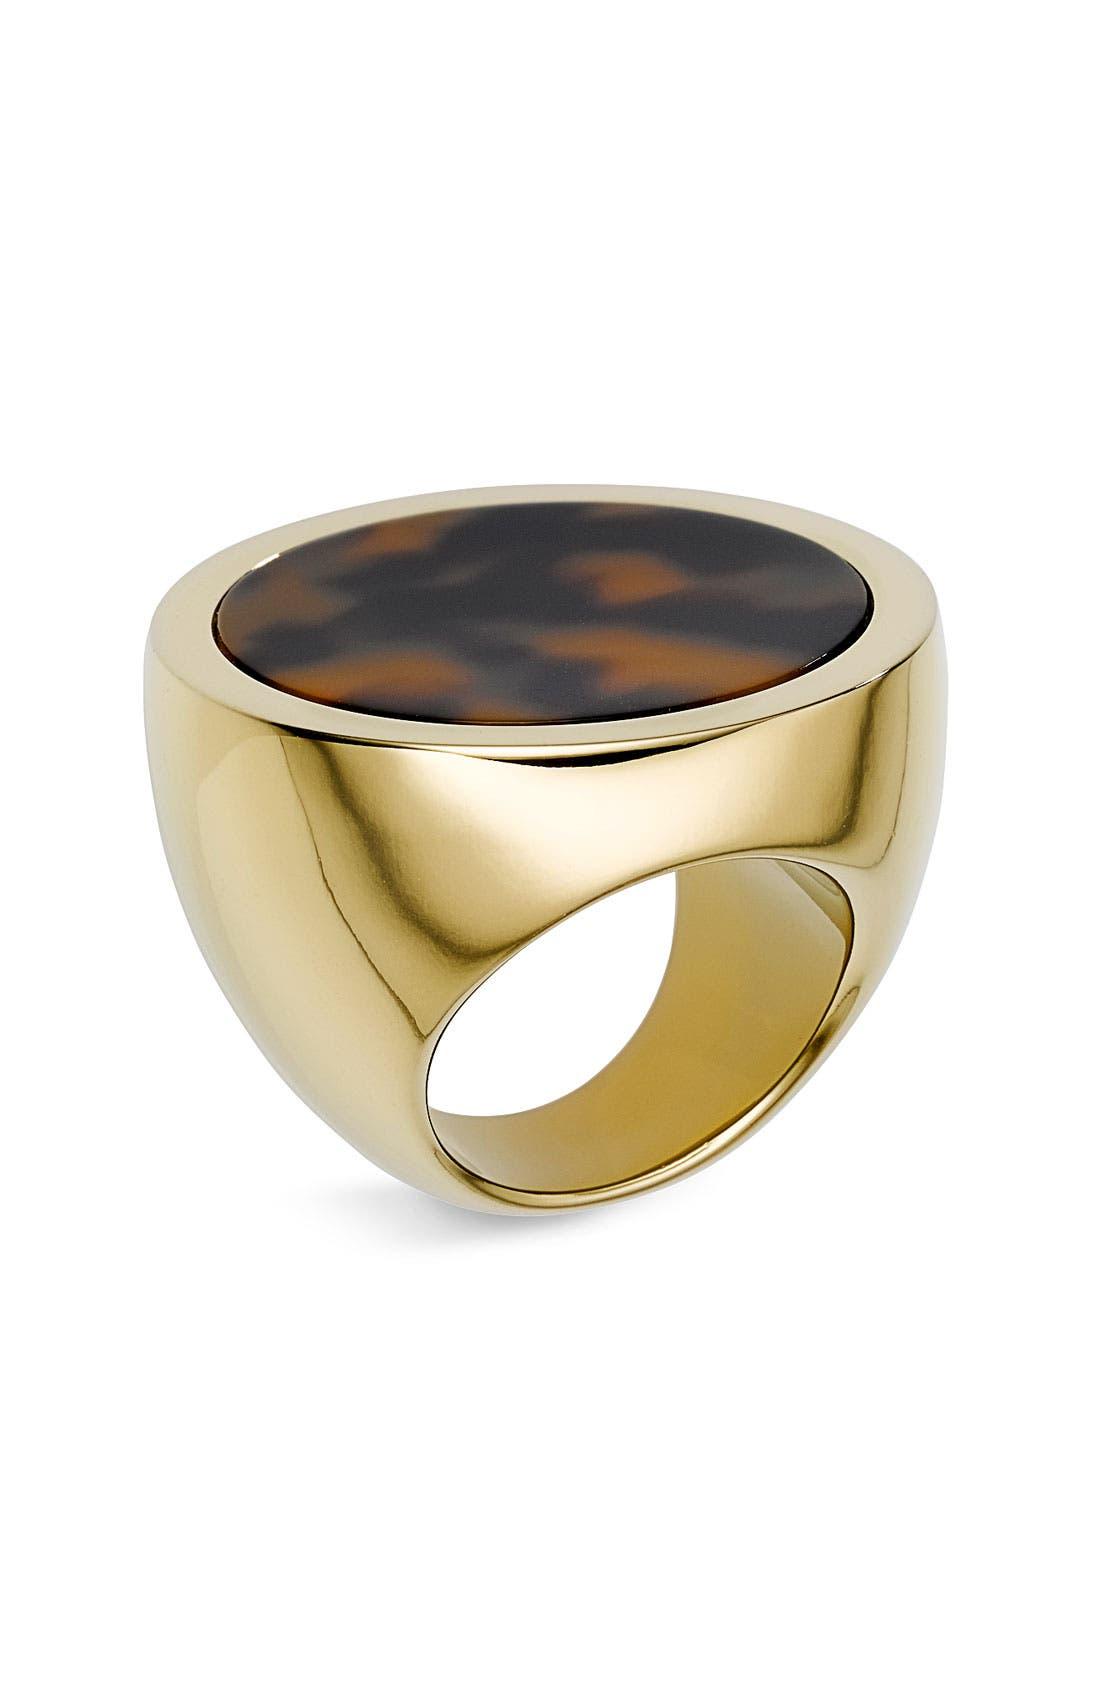 Main Image - Michael Kors Large Slice Ring